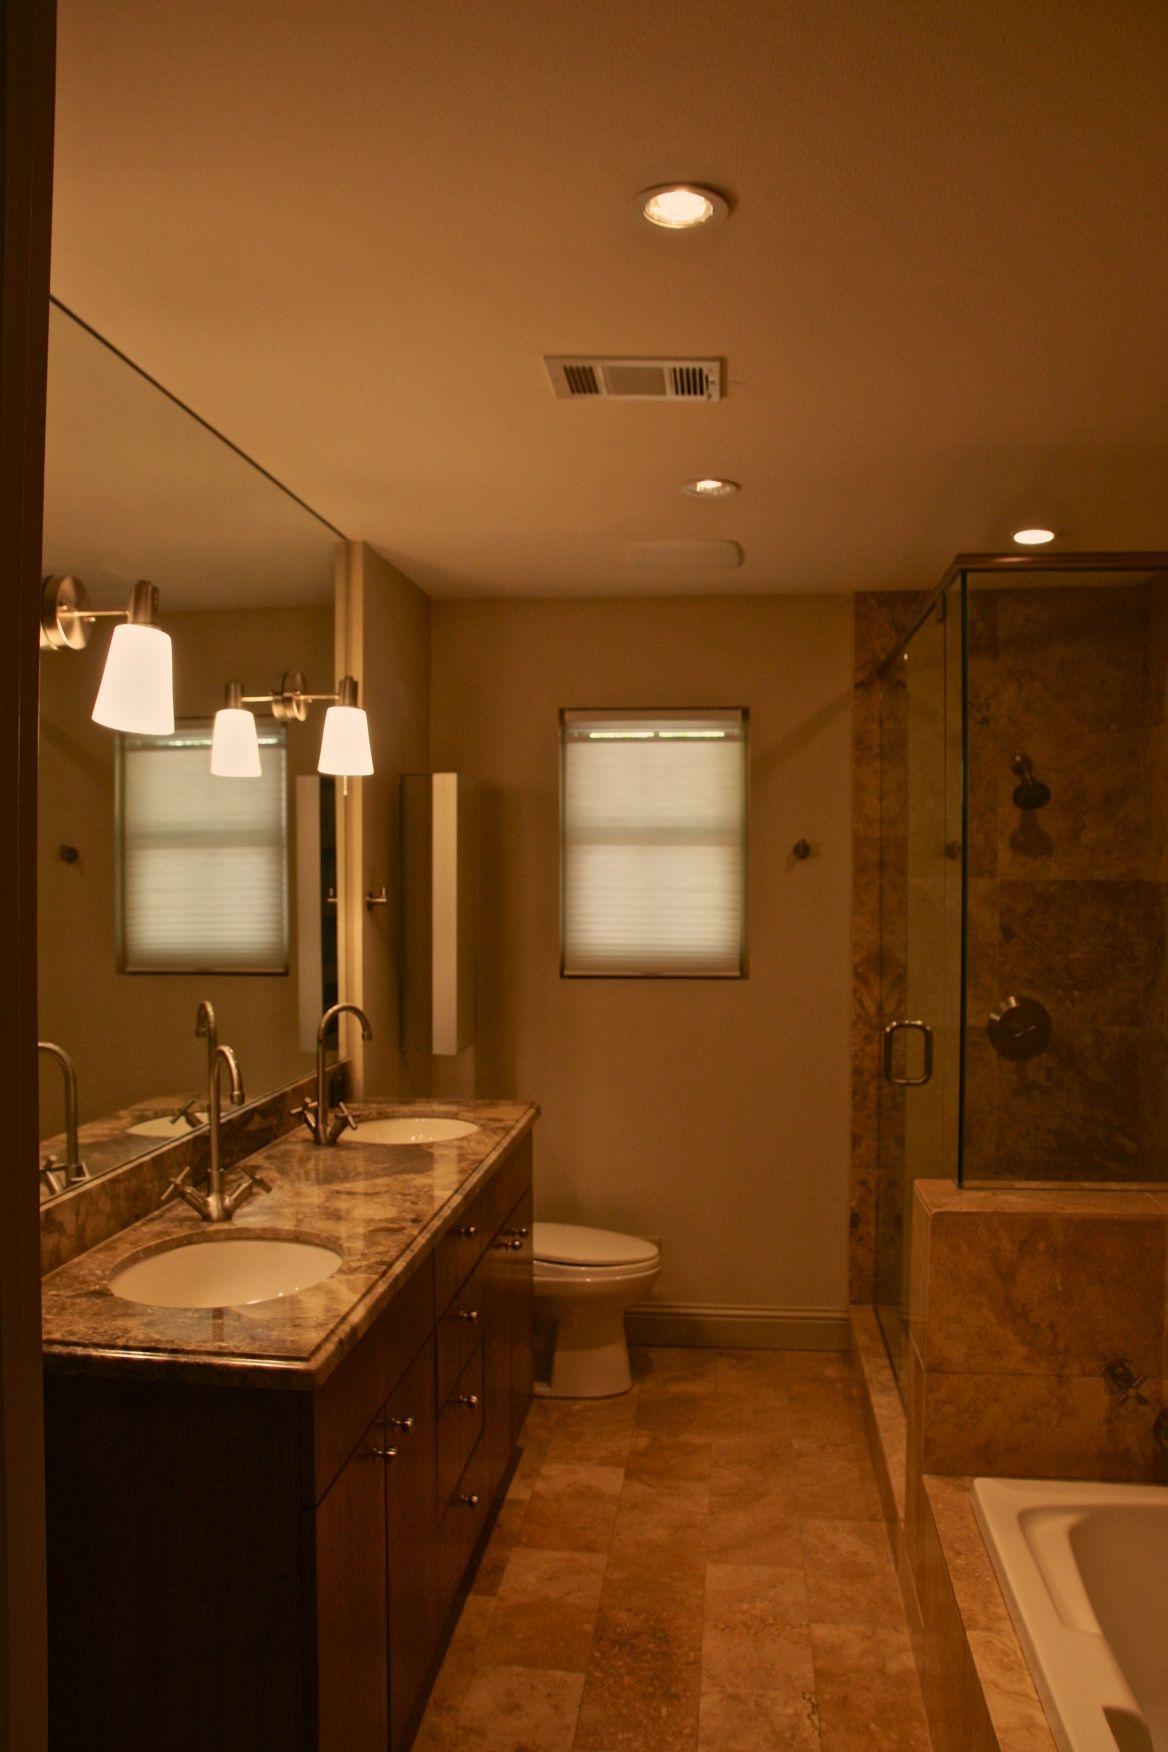 Master bedroom bathroom layout  Master bathroom before new paint  home sweet home  Pinterest